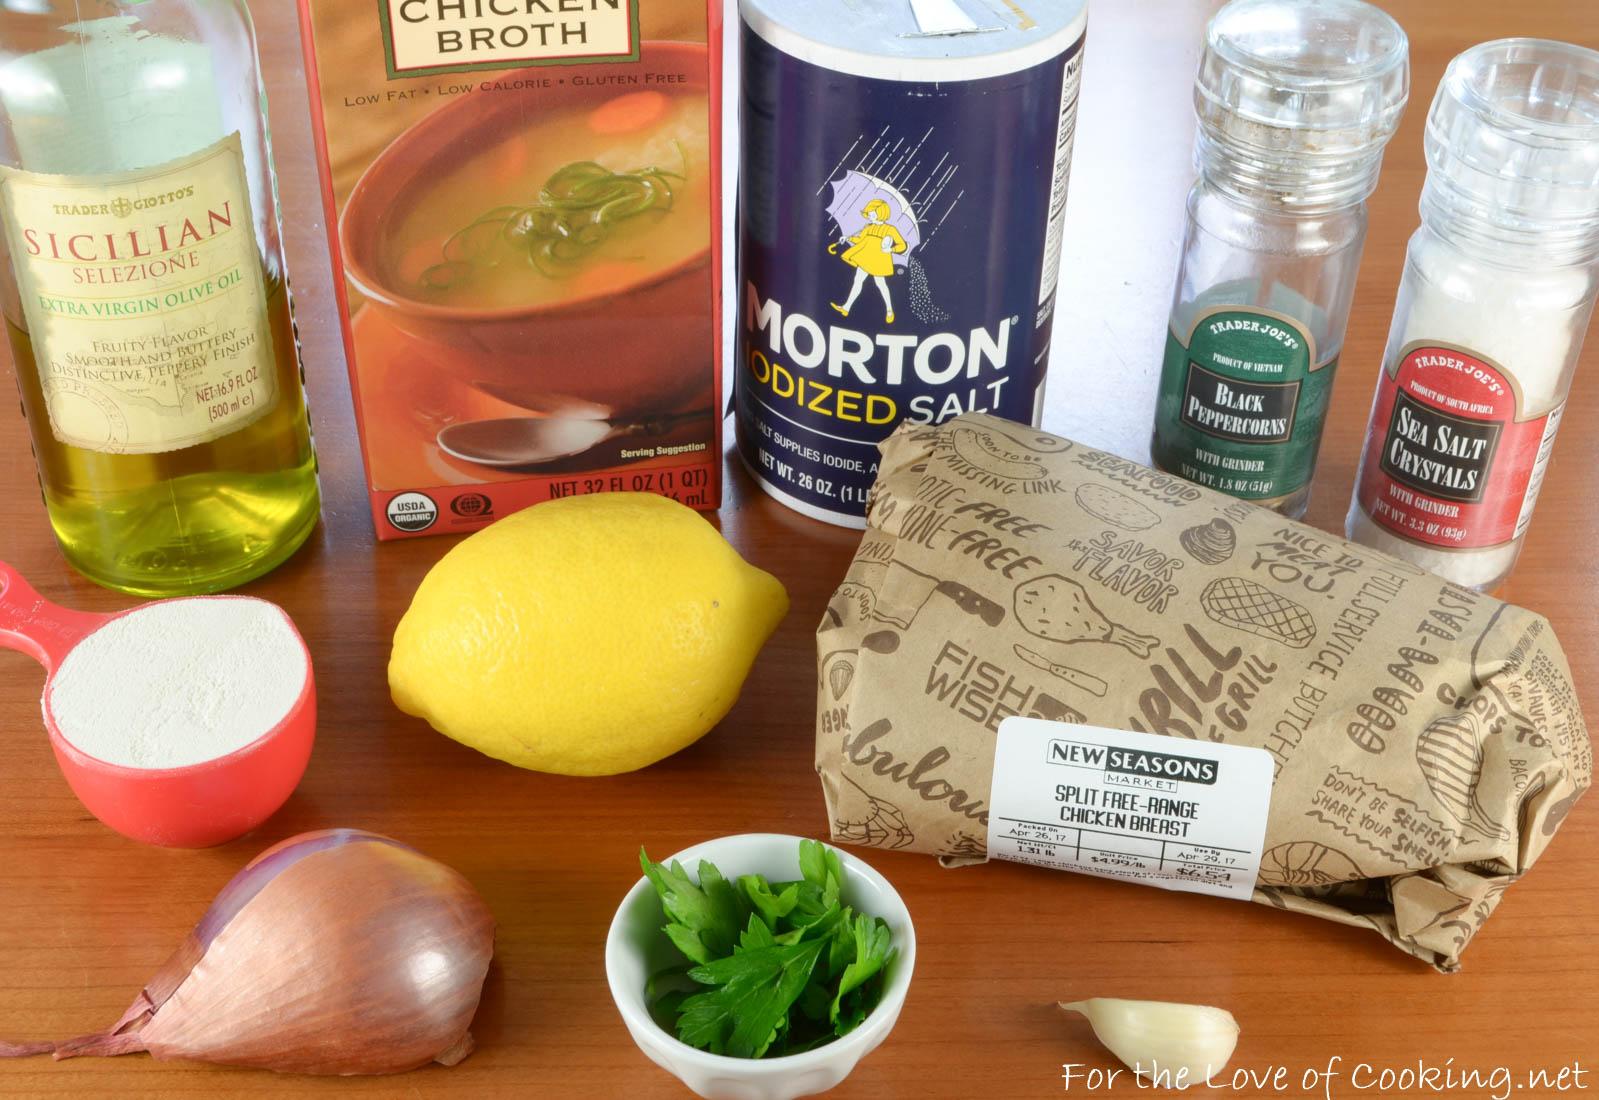 Skillet-Roasted Chicken Breasts in Lemon Sauce